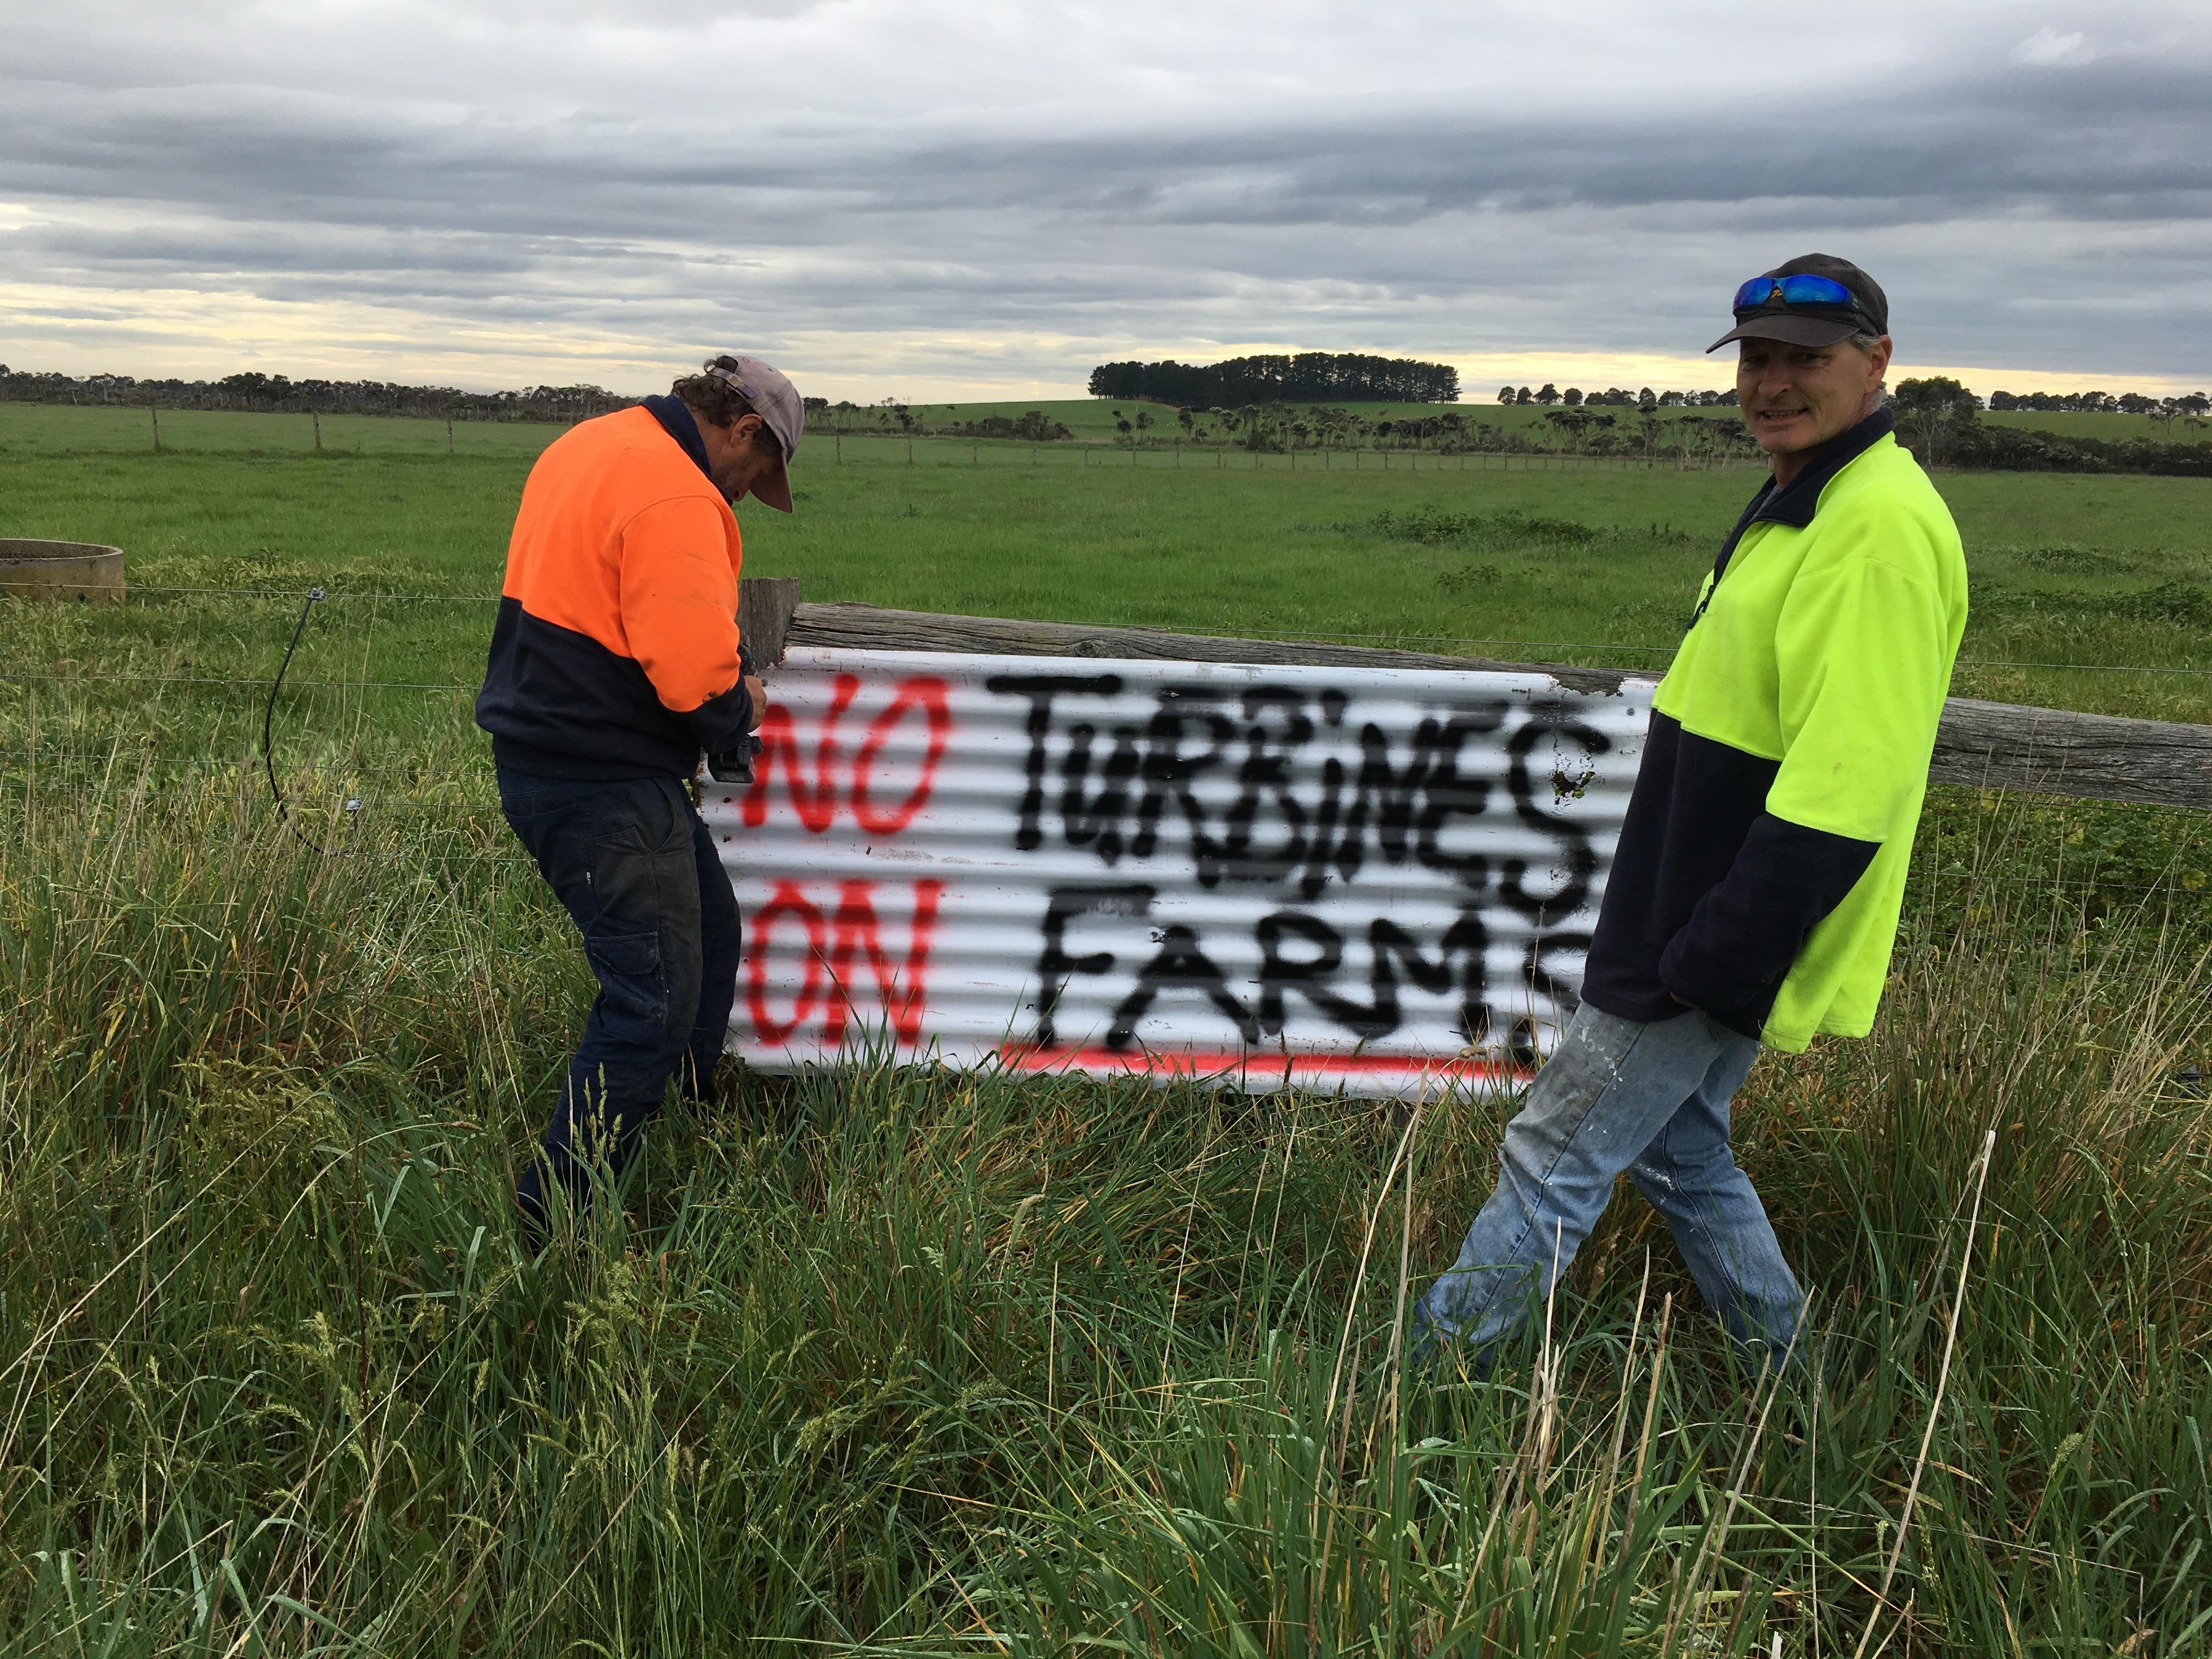 No turbines sign in paddock